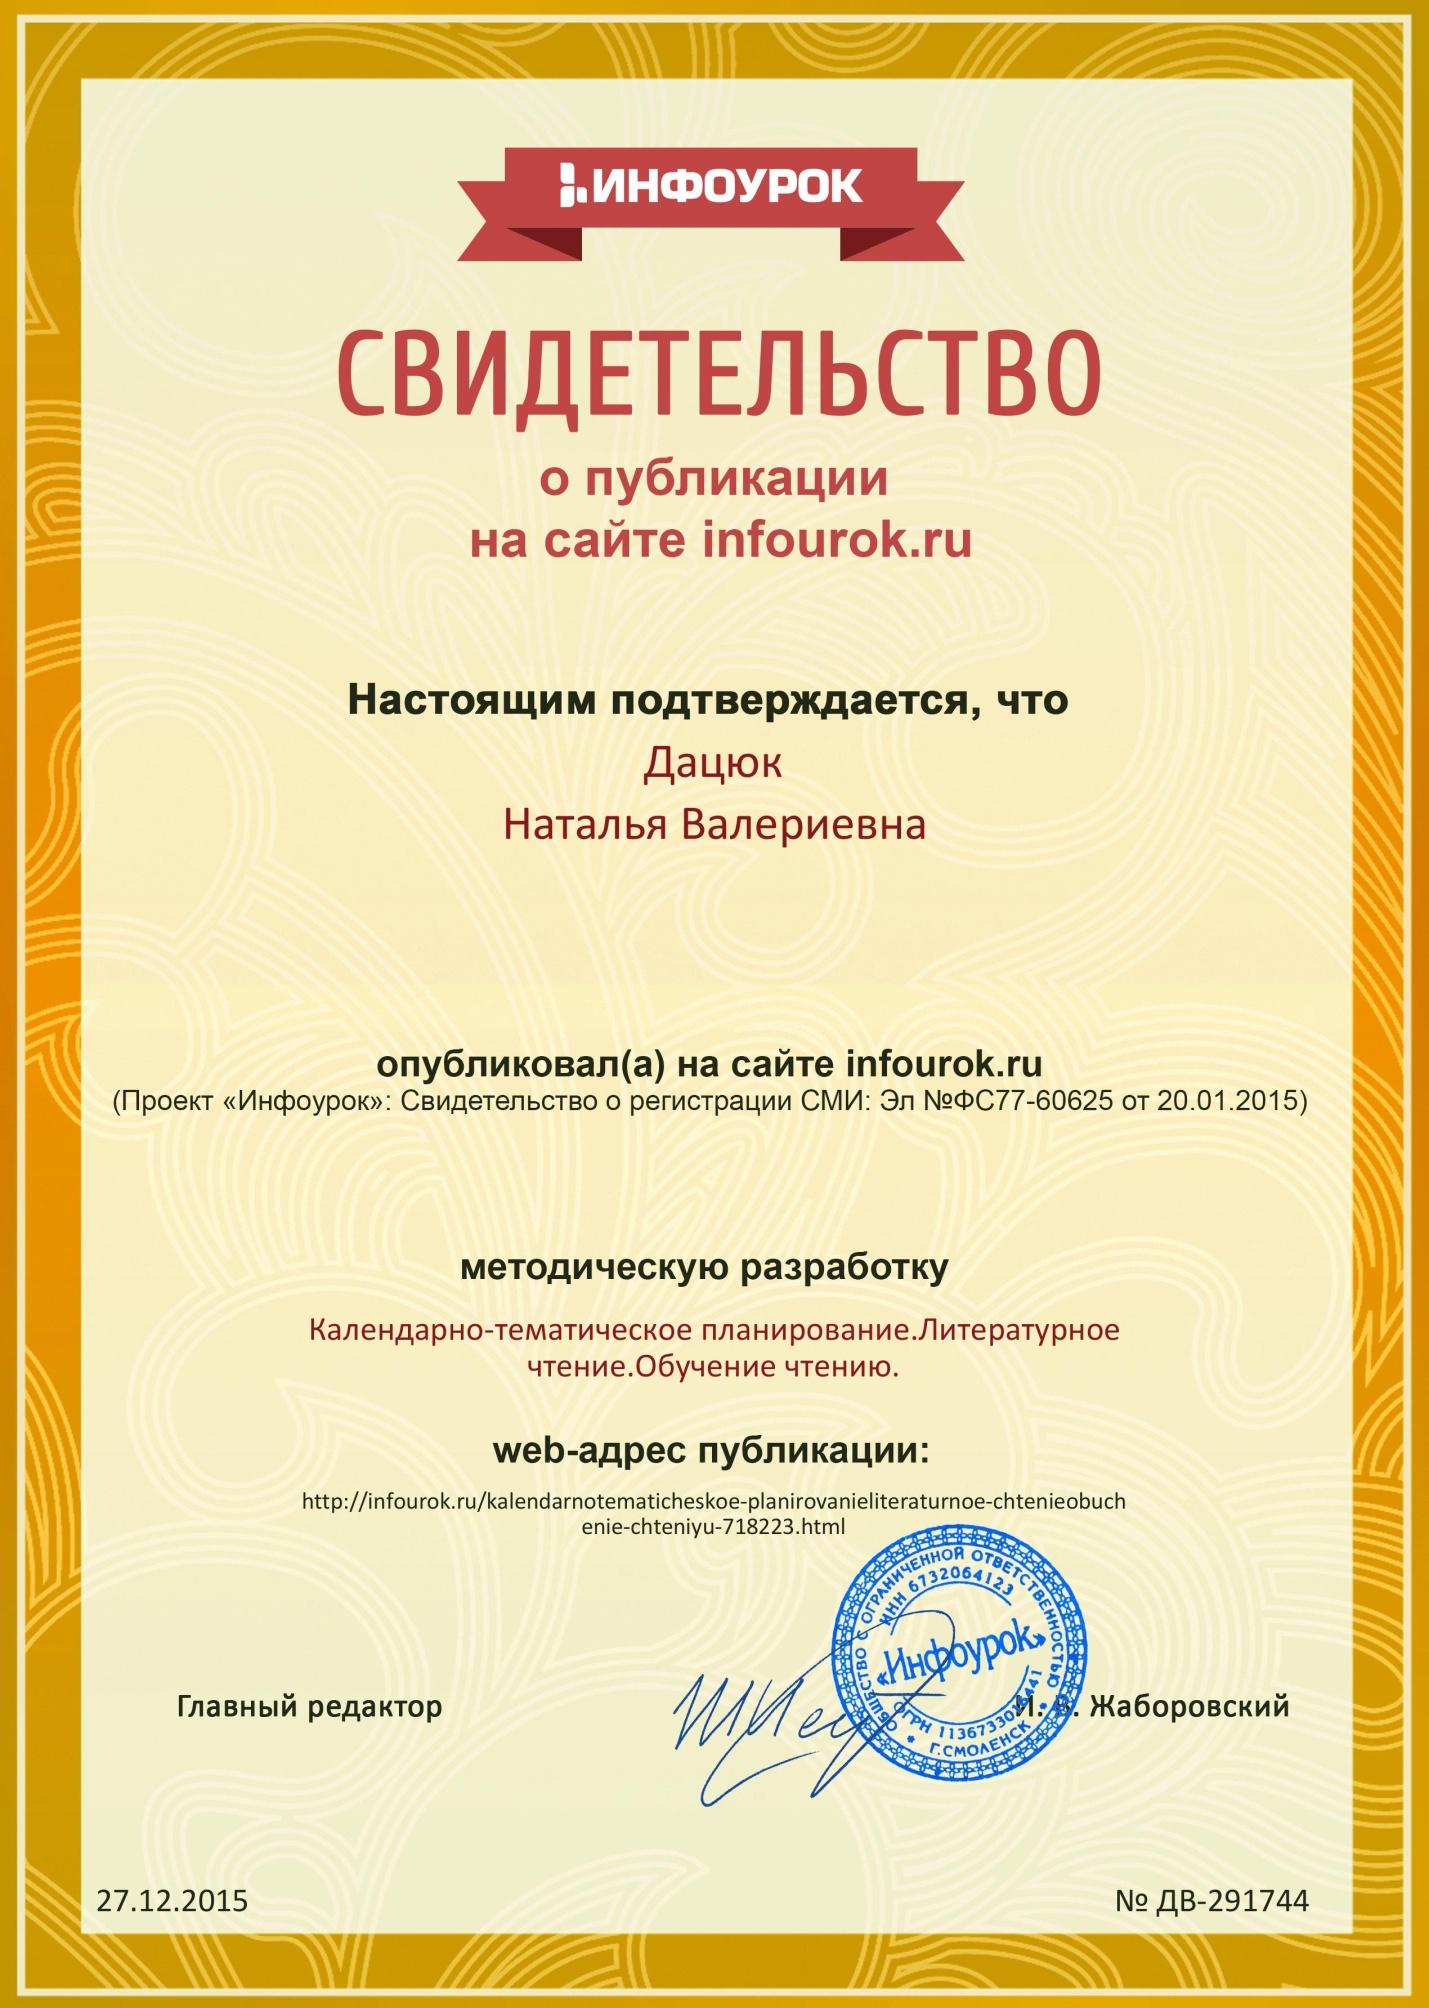 Сертификат проекта infourok.ru № ДВ-291744.jpg